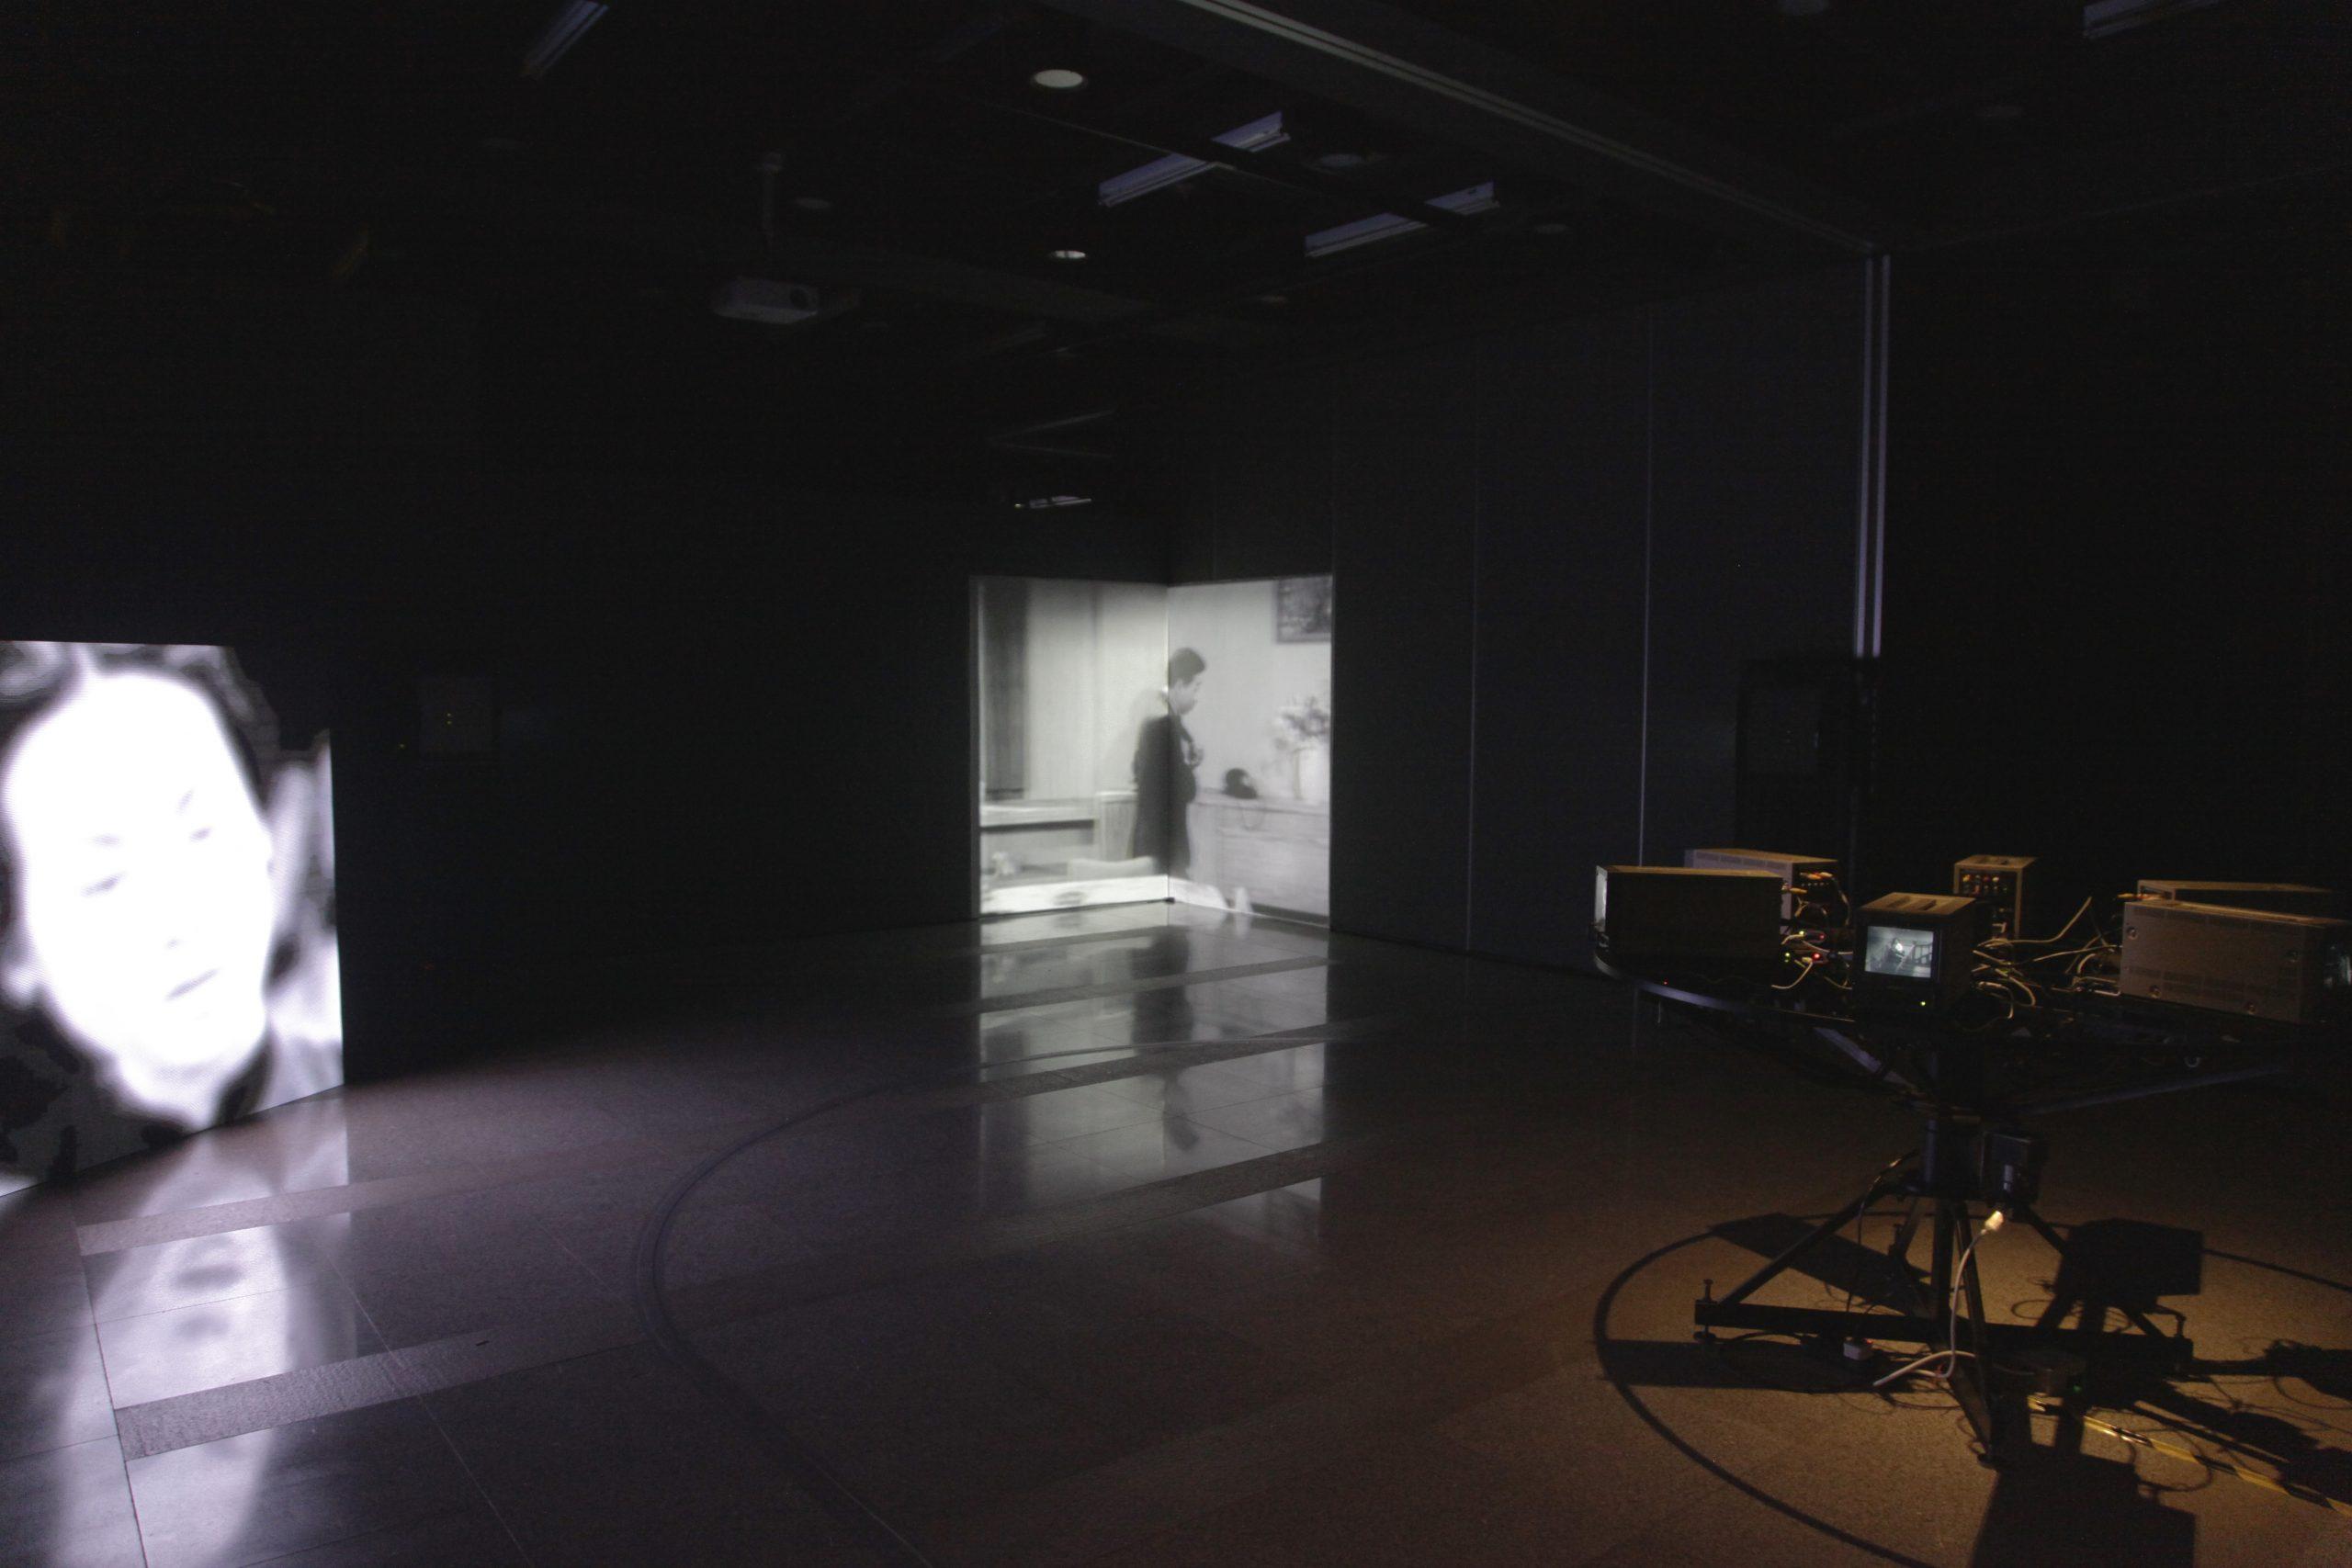 Solitude Cinema